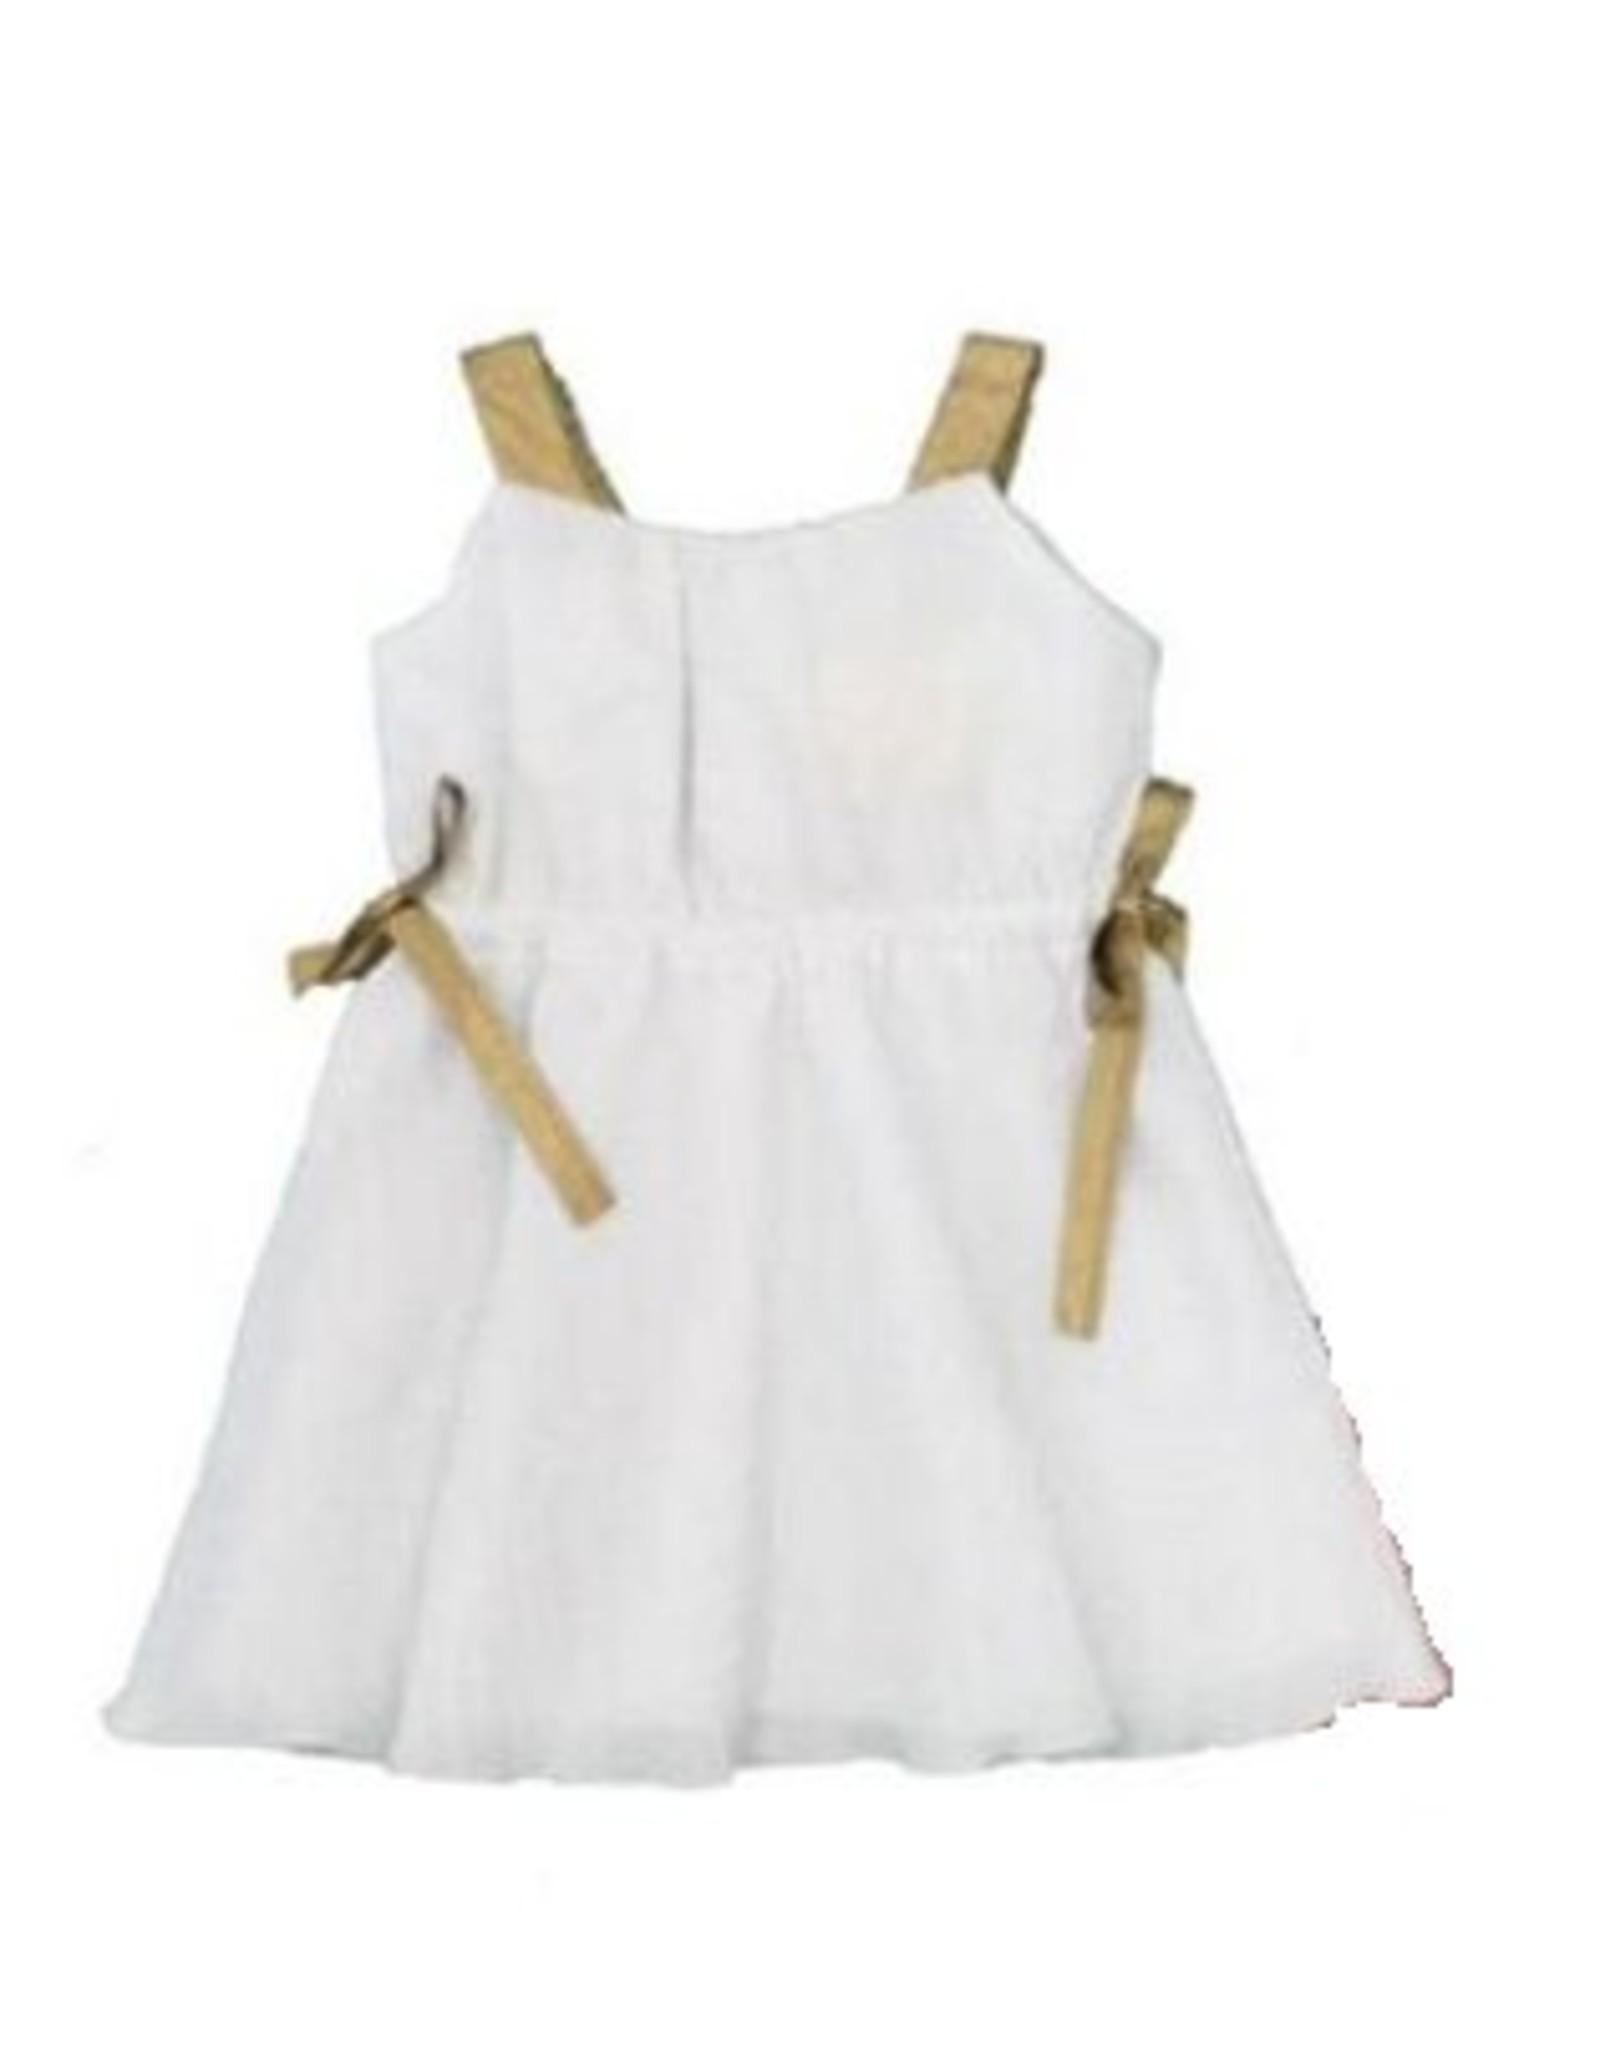 SLICE Slice Crinkle Dress with Gold Straps